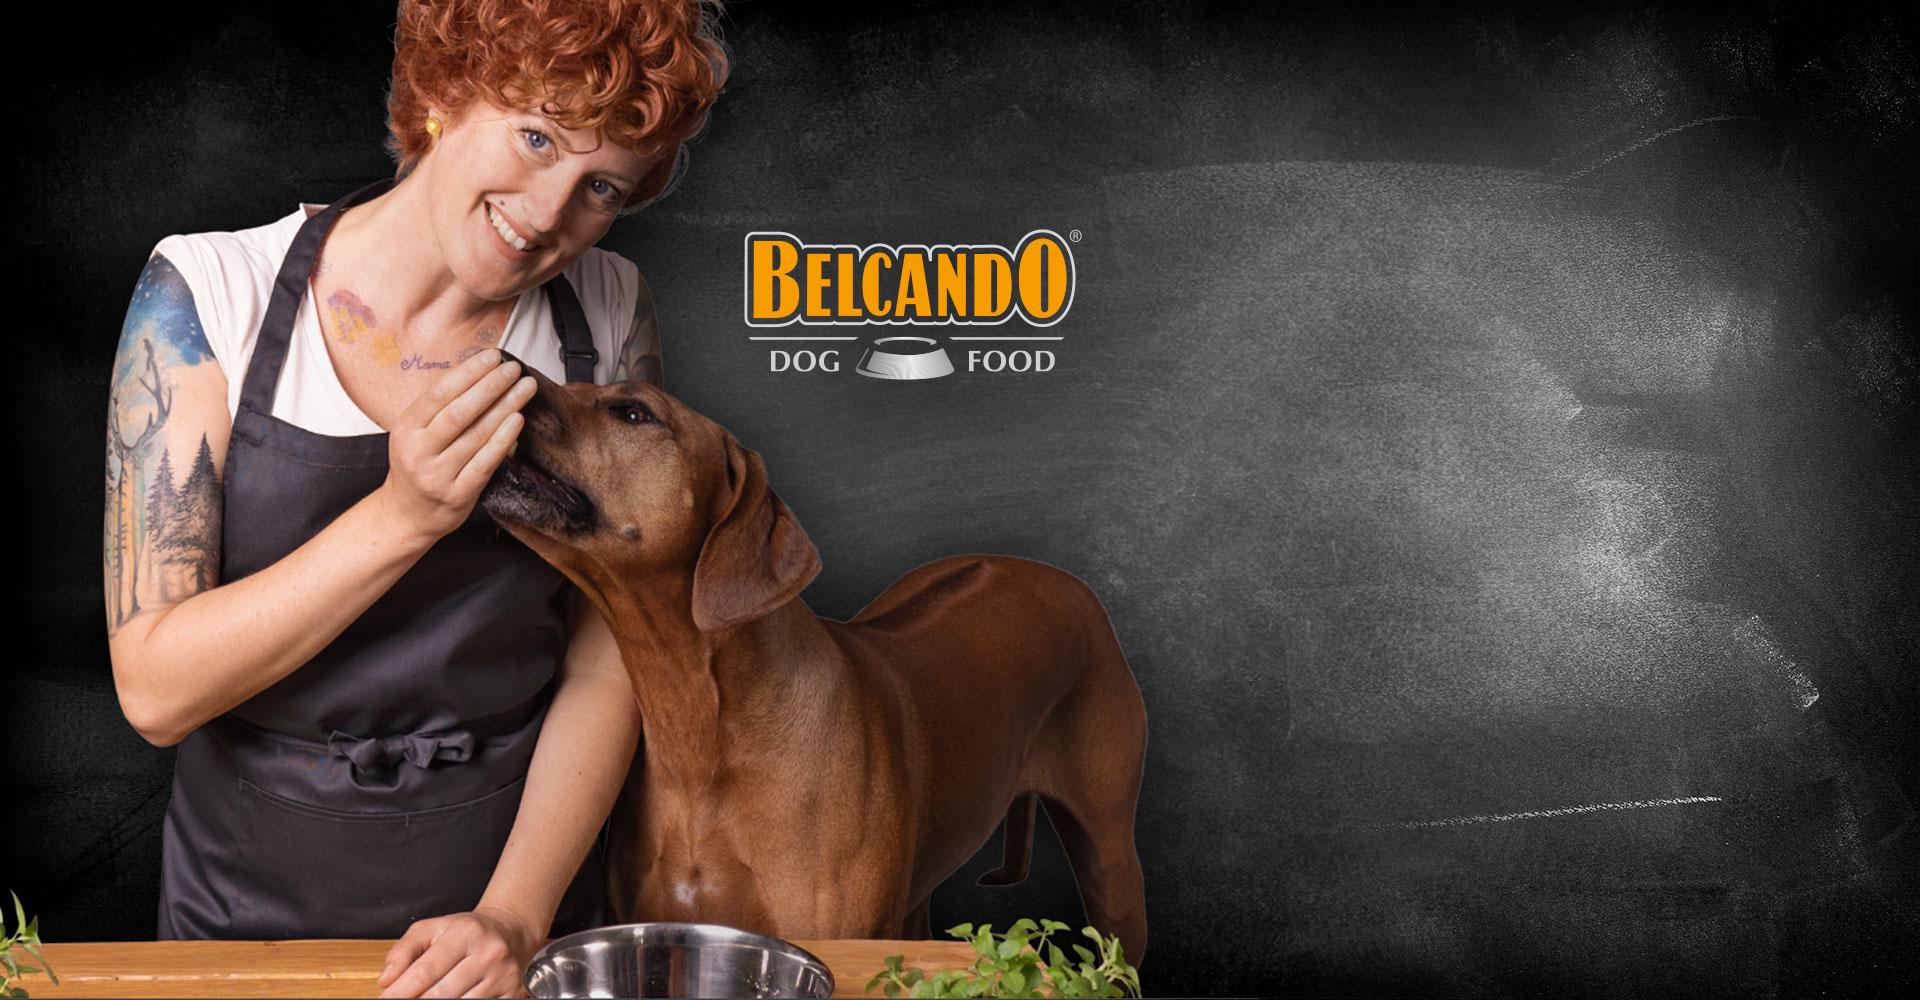 Belcando dogfood